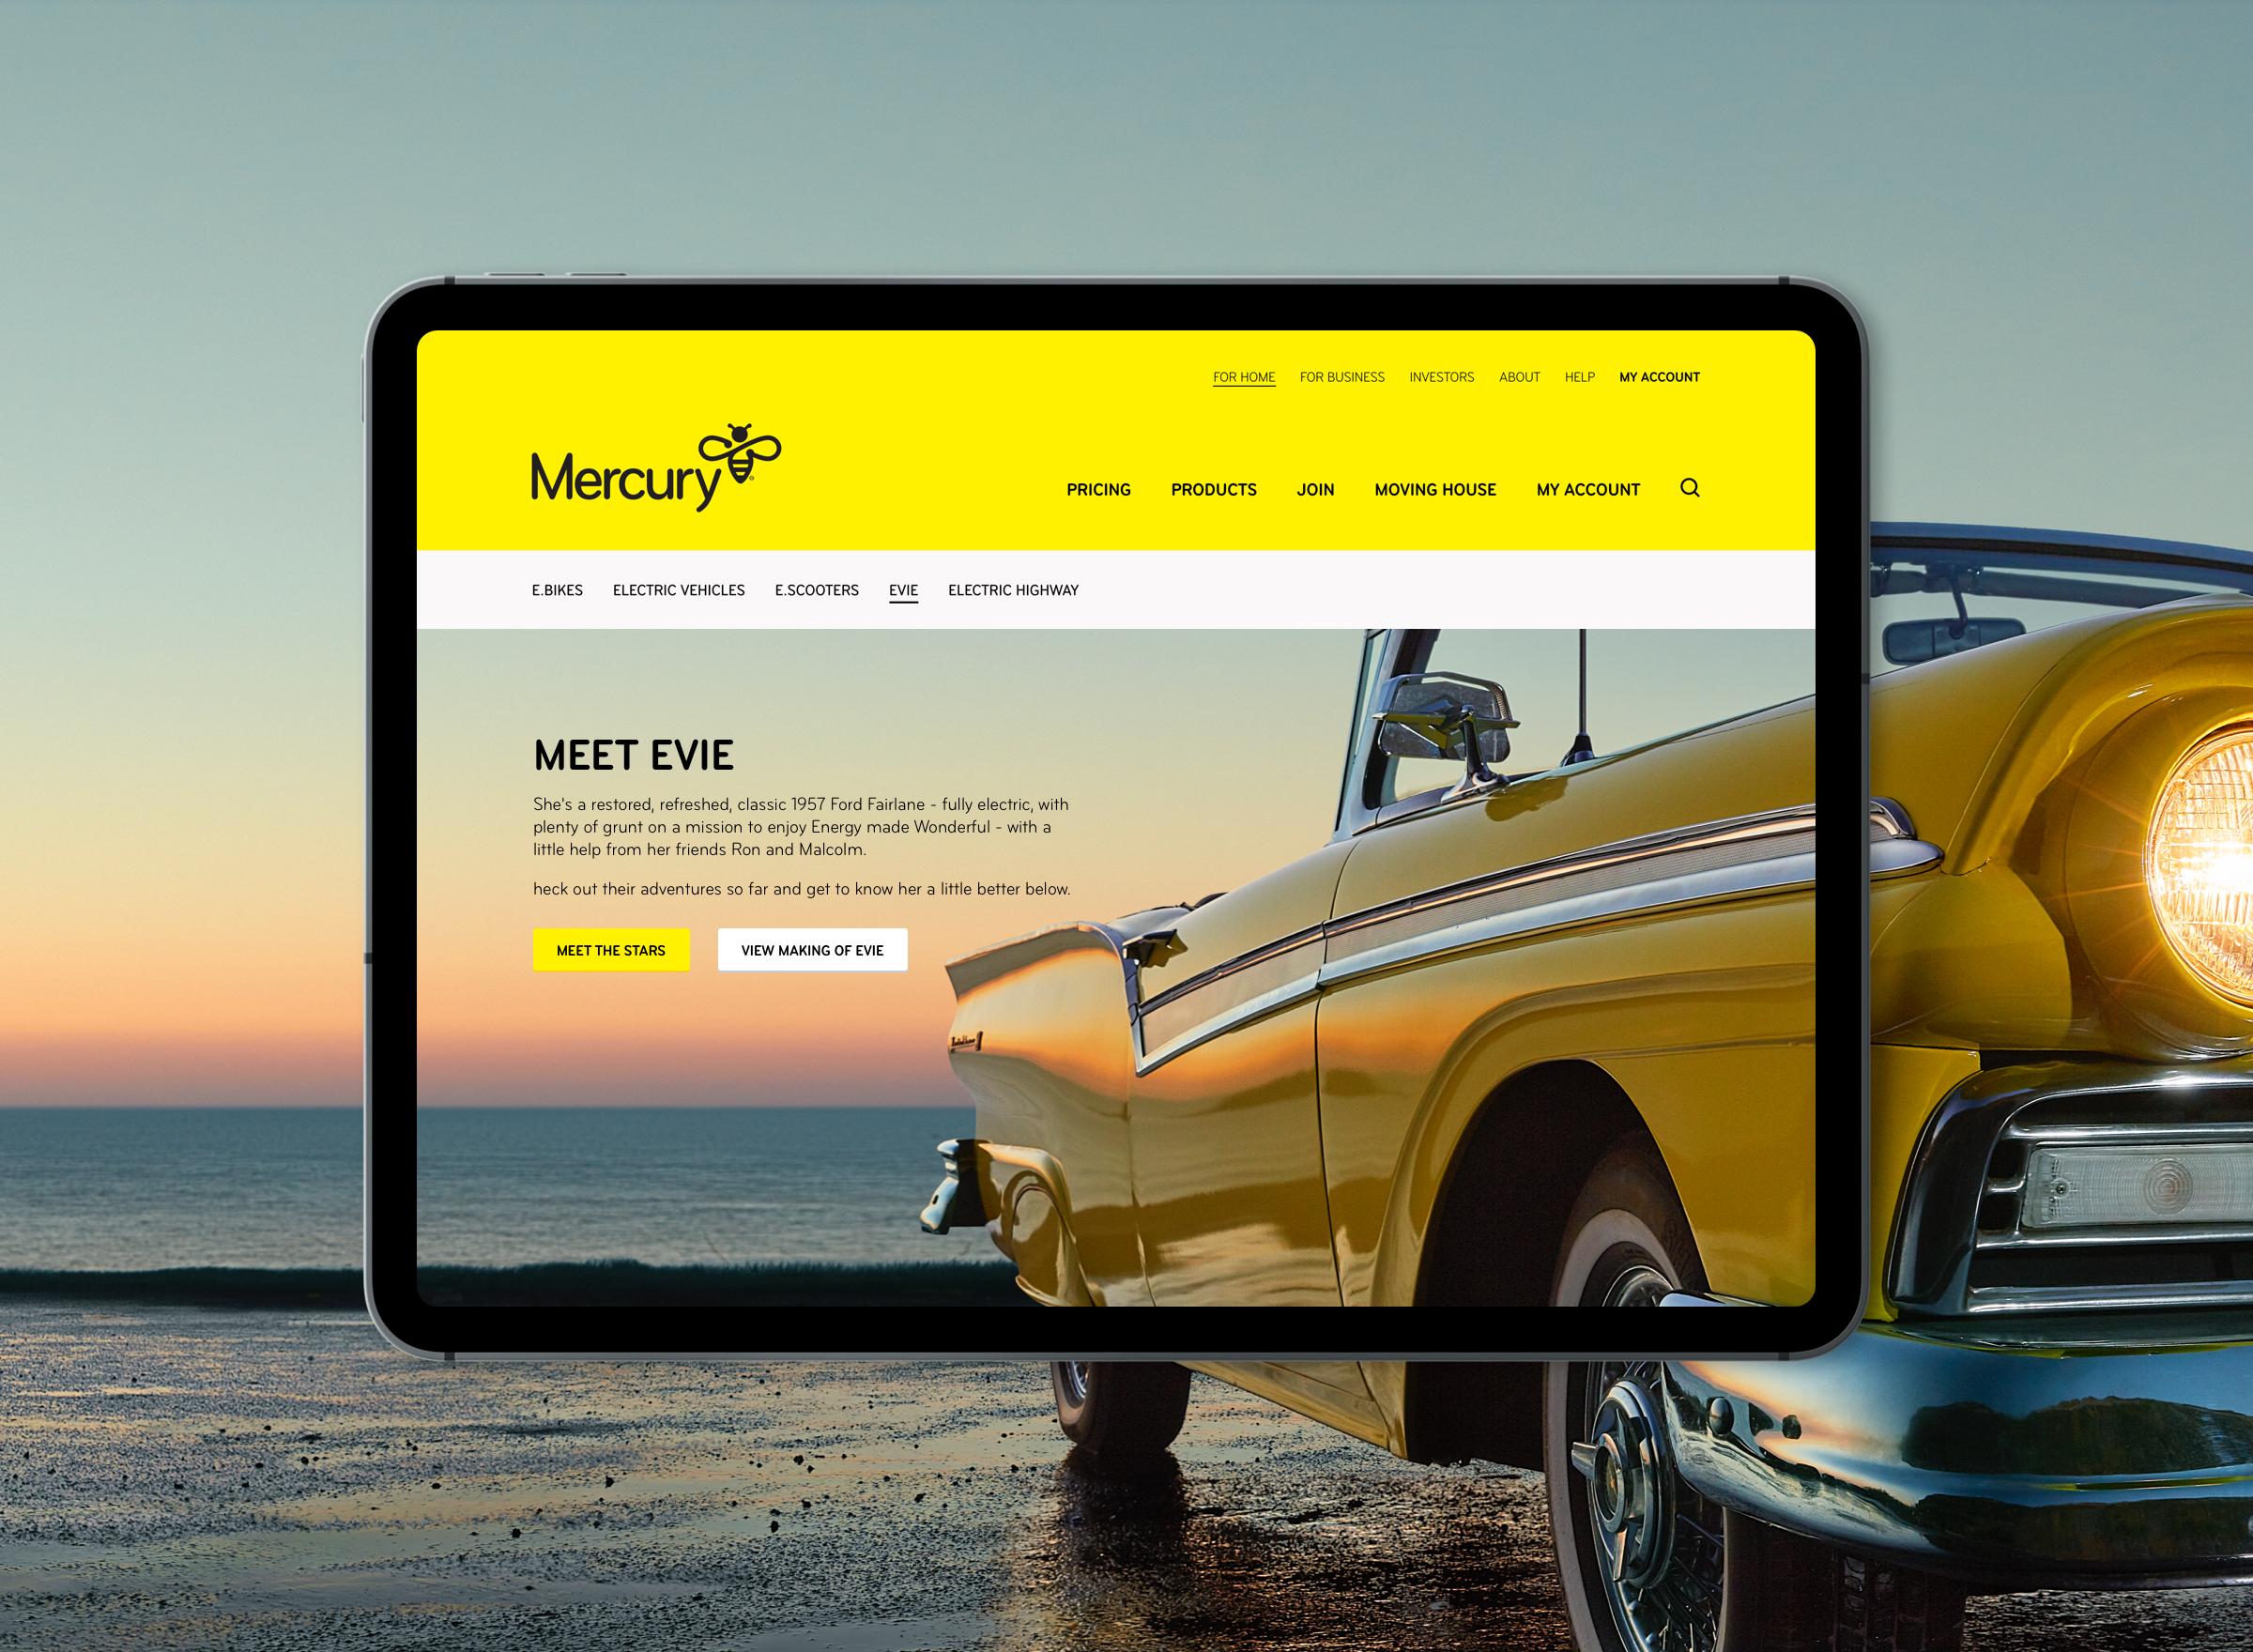 Mercury Website - Meet Evie@2x.jpg